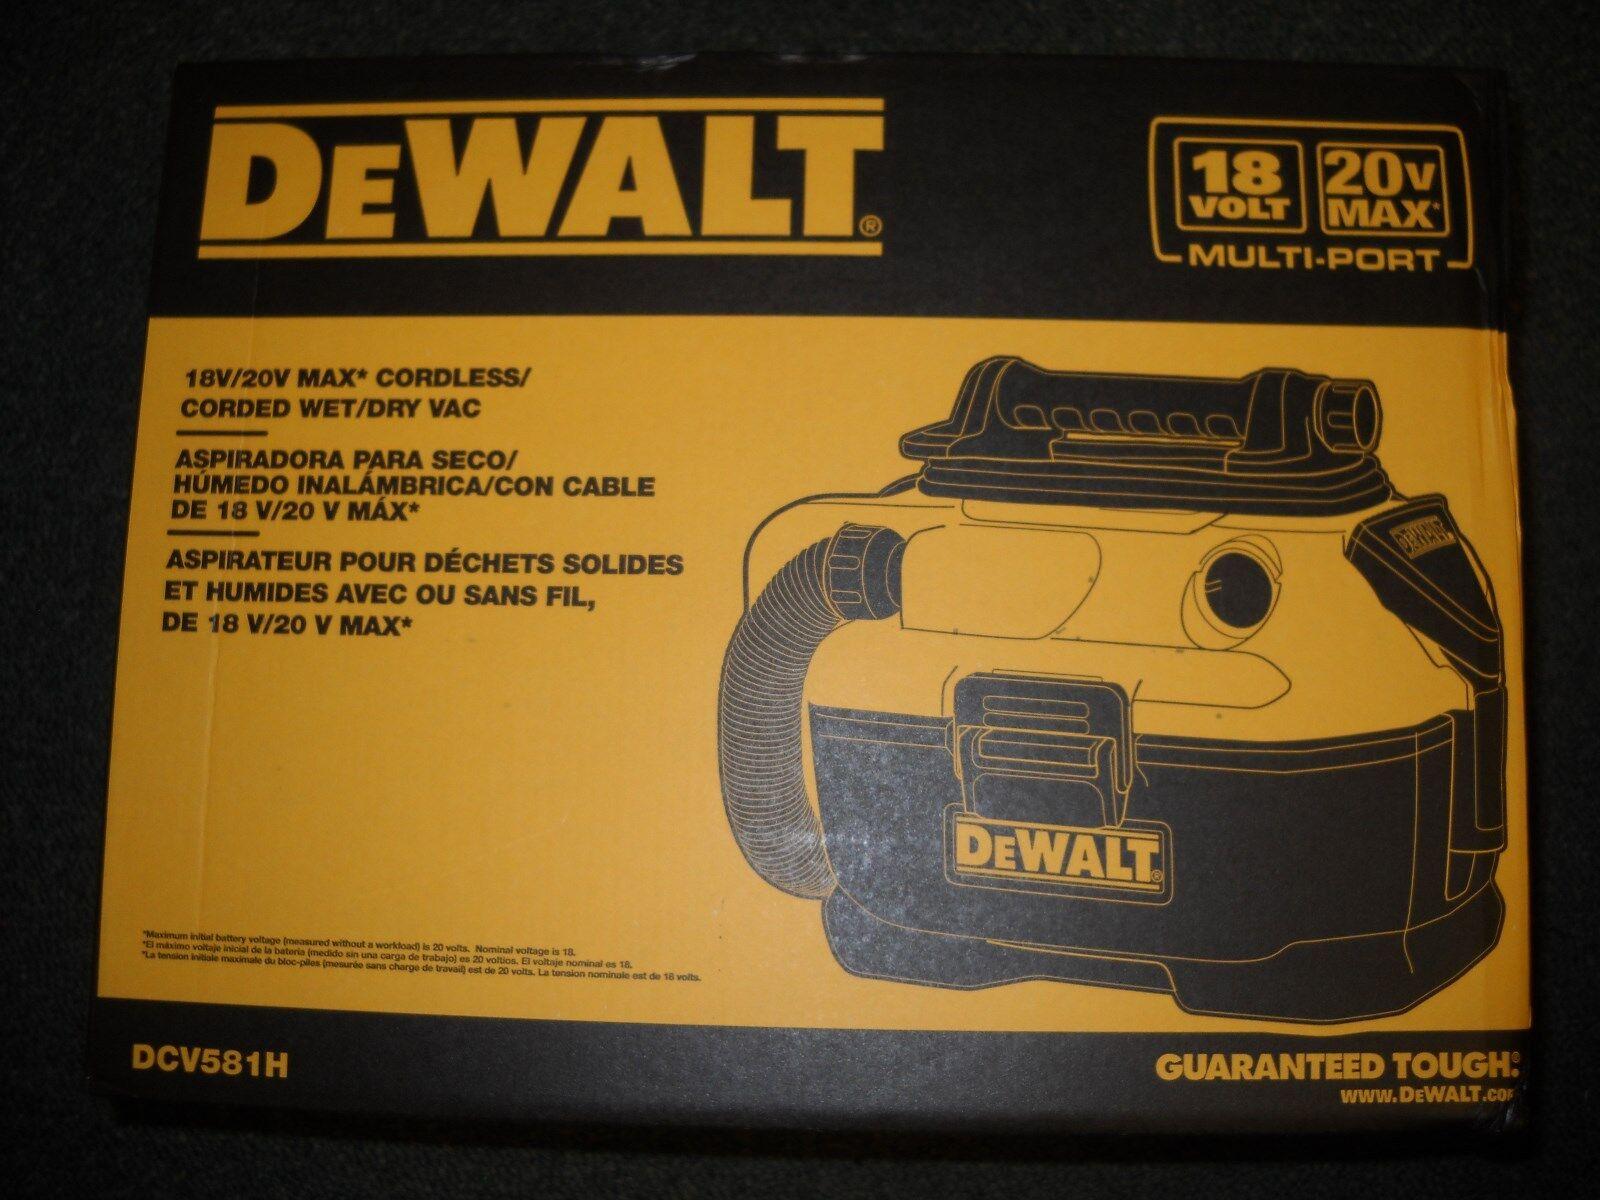 DEWALT DCV581H 18 20 Volt MAX Cordless Corded Wet-Dry Vacuum